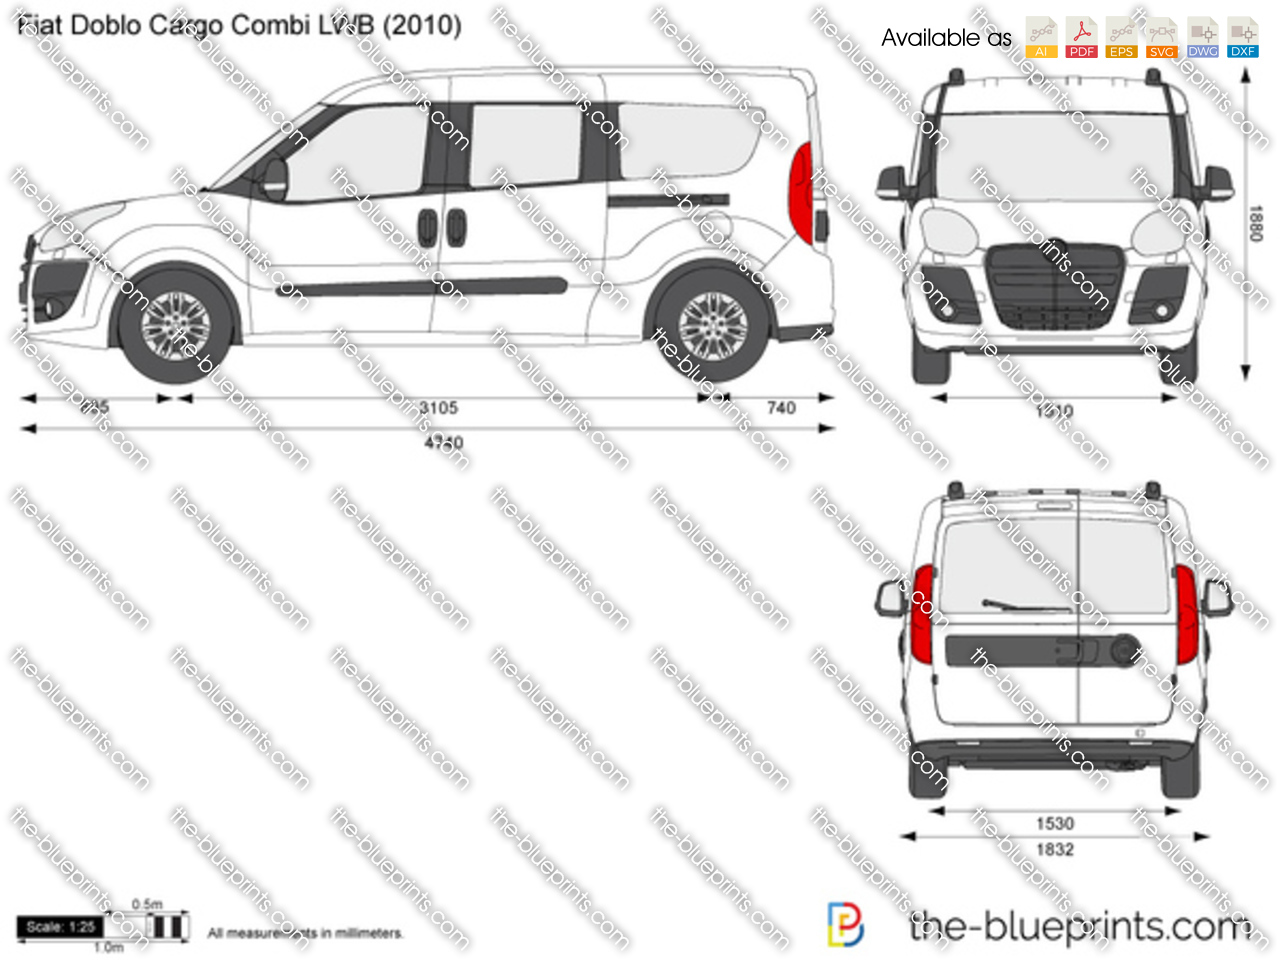 Fiat Doblo Cargo Combi LWB 2012